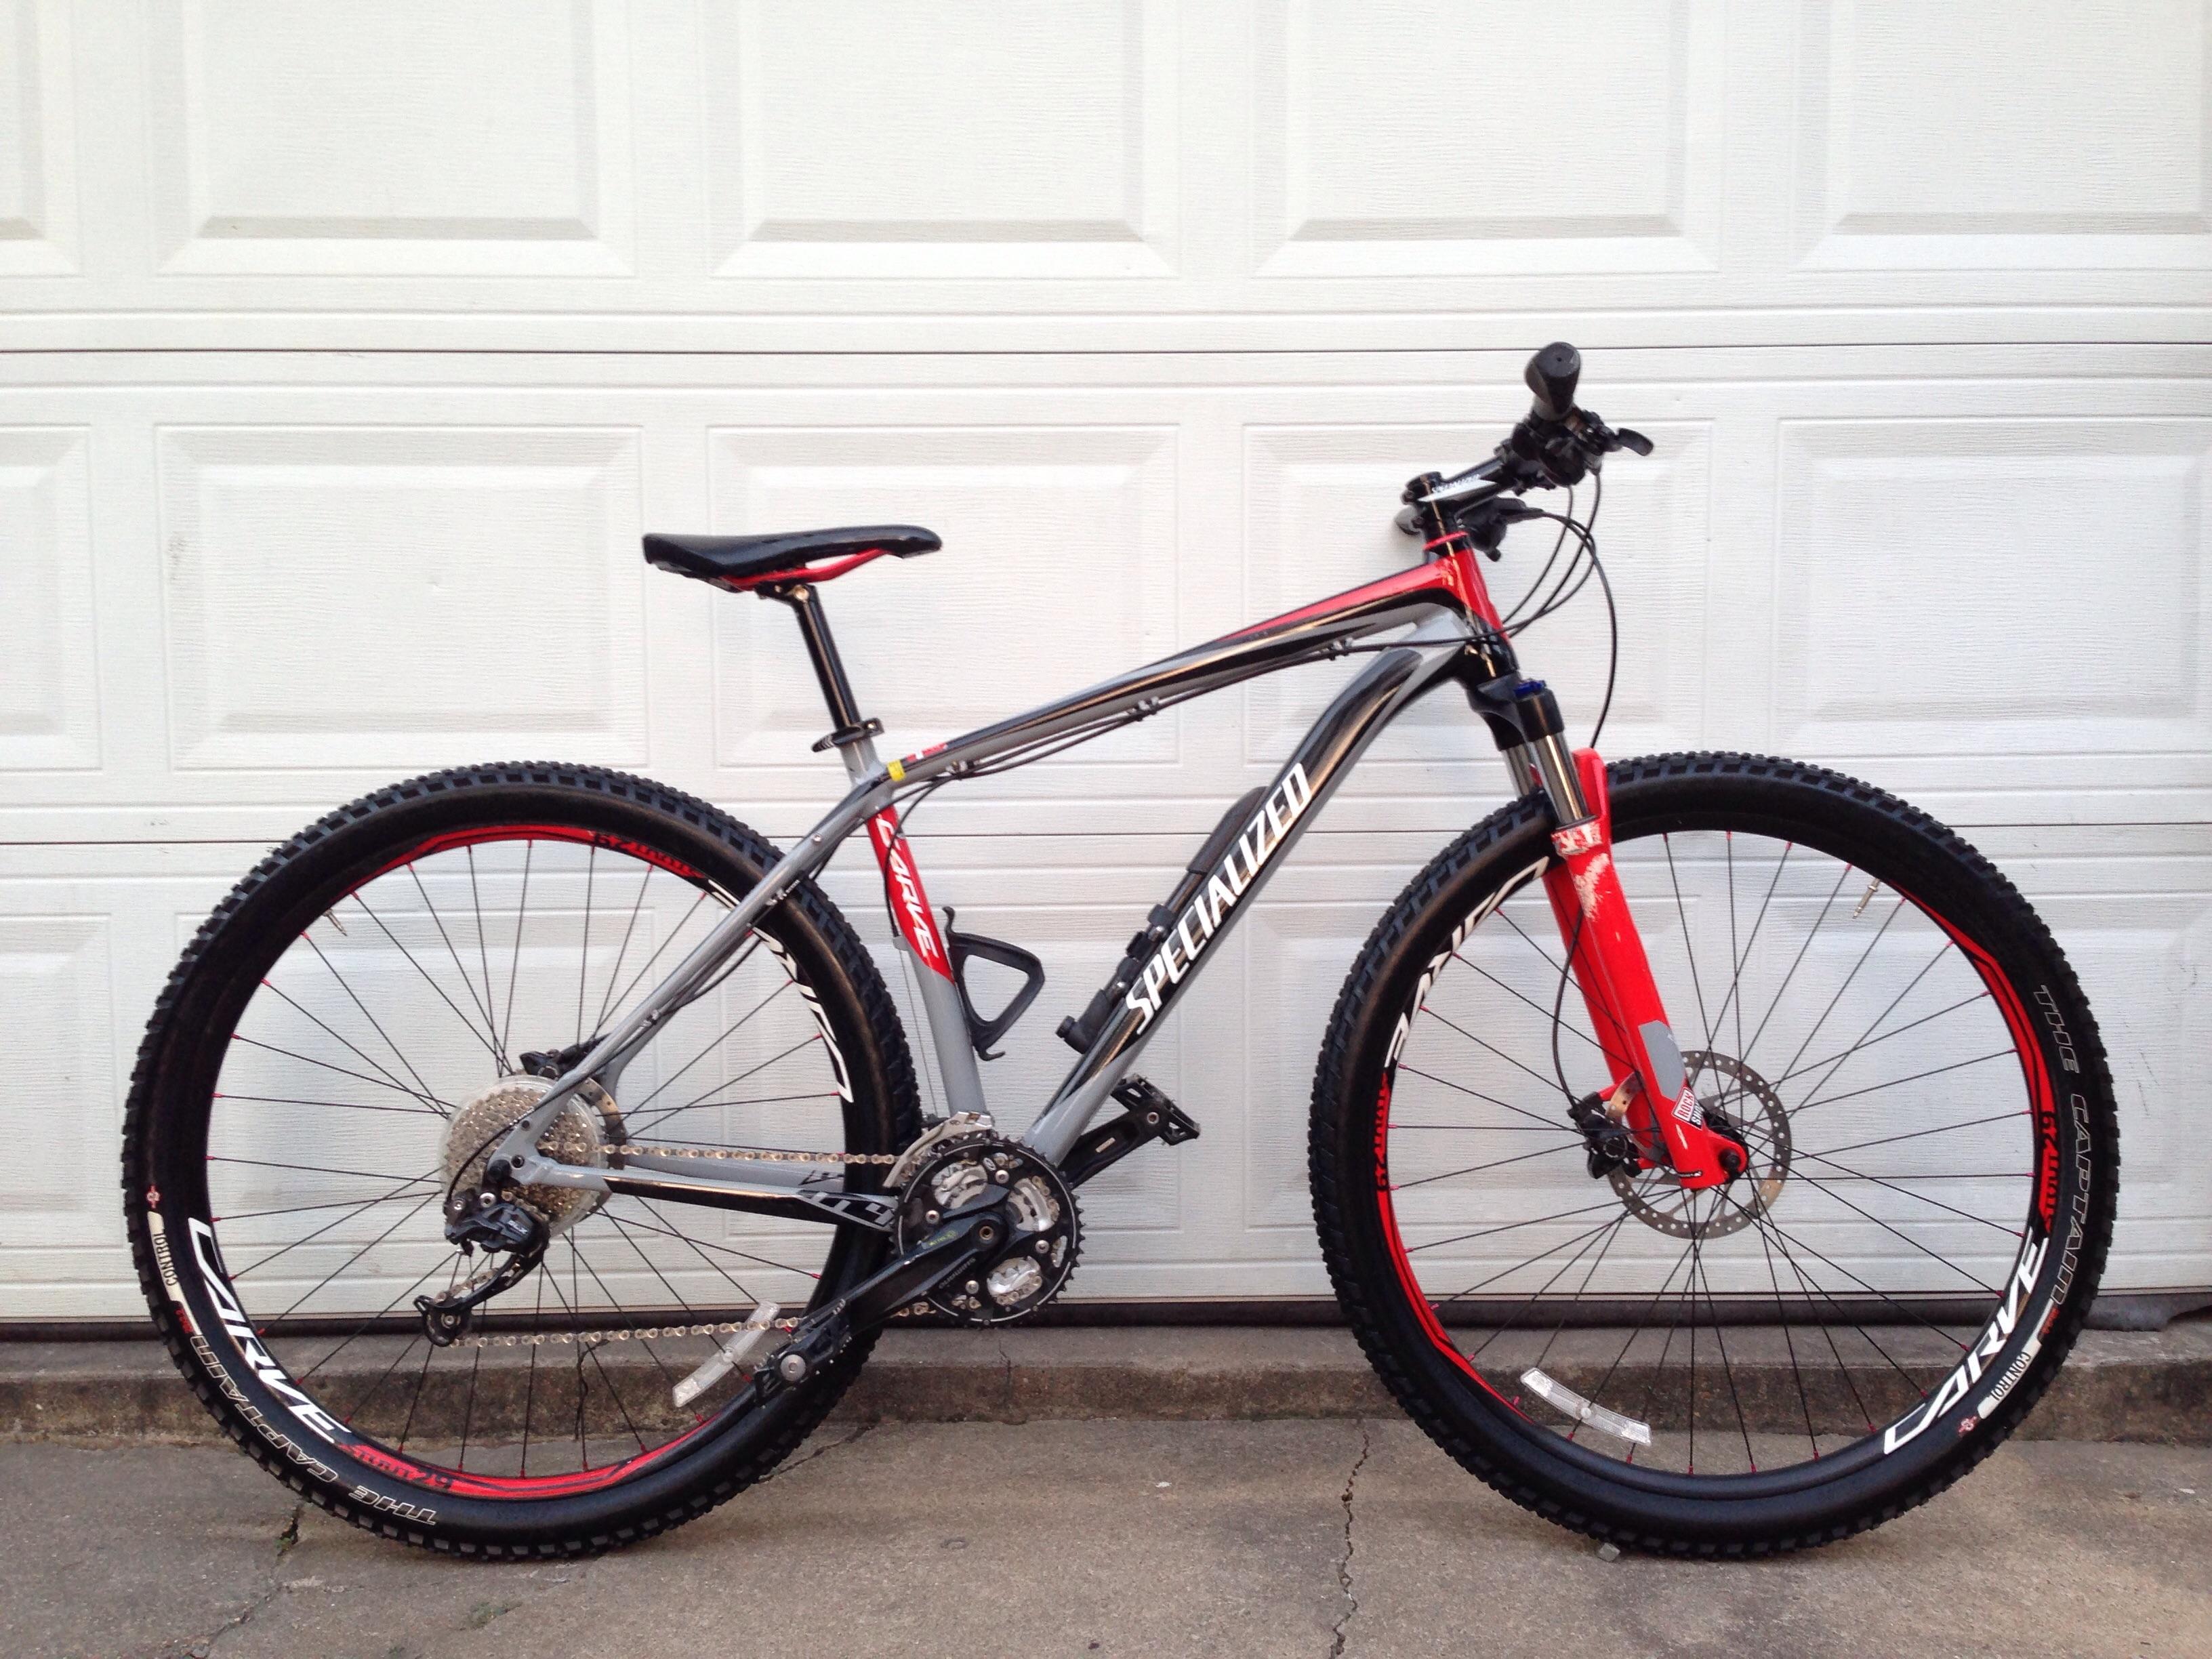 2012 Specialized Carve Comp 29er – $770 – Gomez Bike Exchange